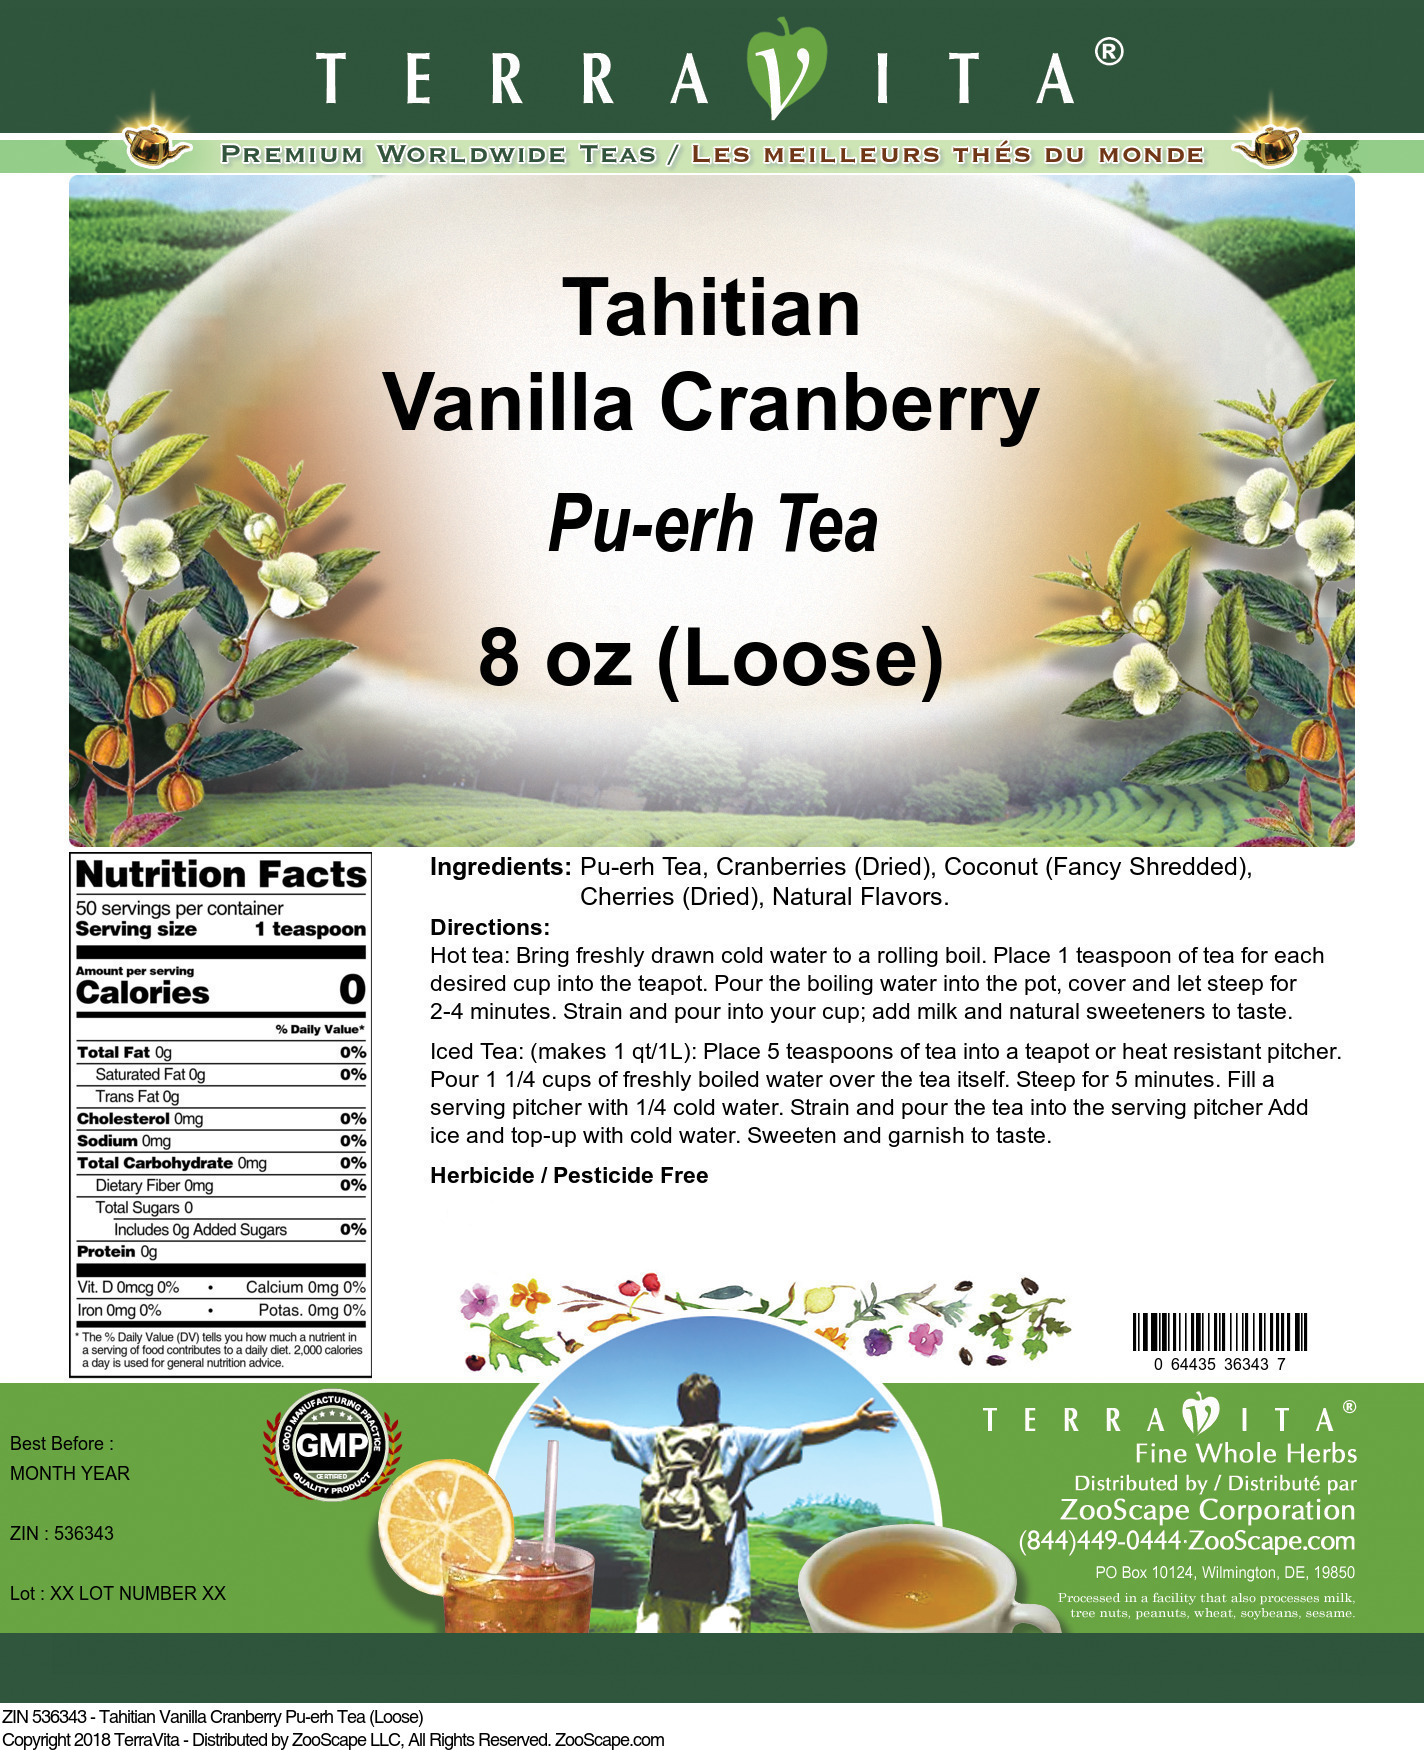 Tahitian Vanilla Cranberry Pu-erh Tea (Loose)